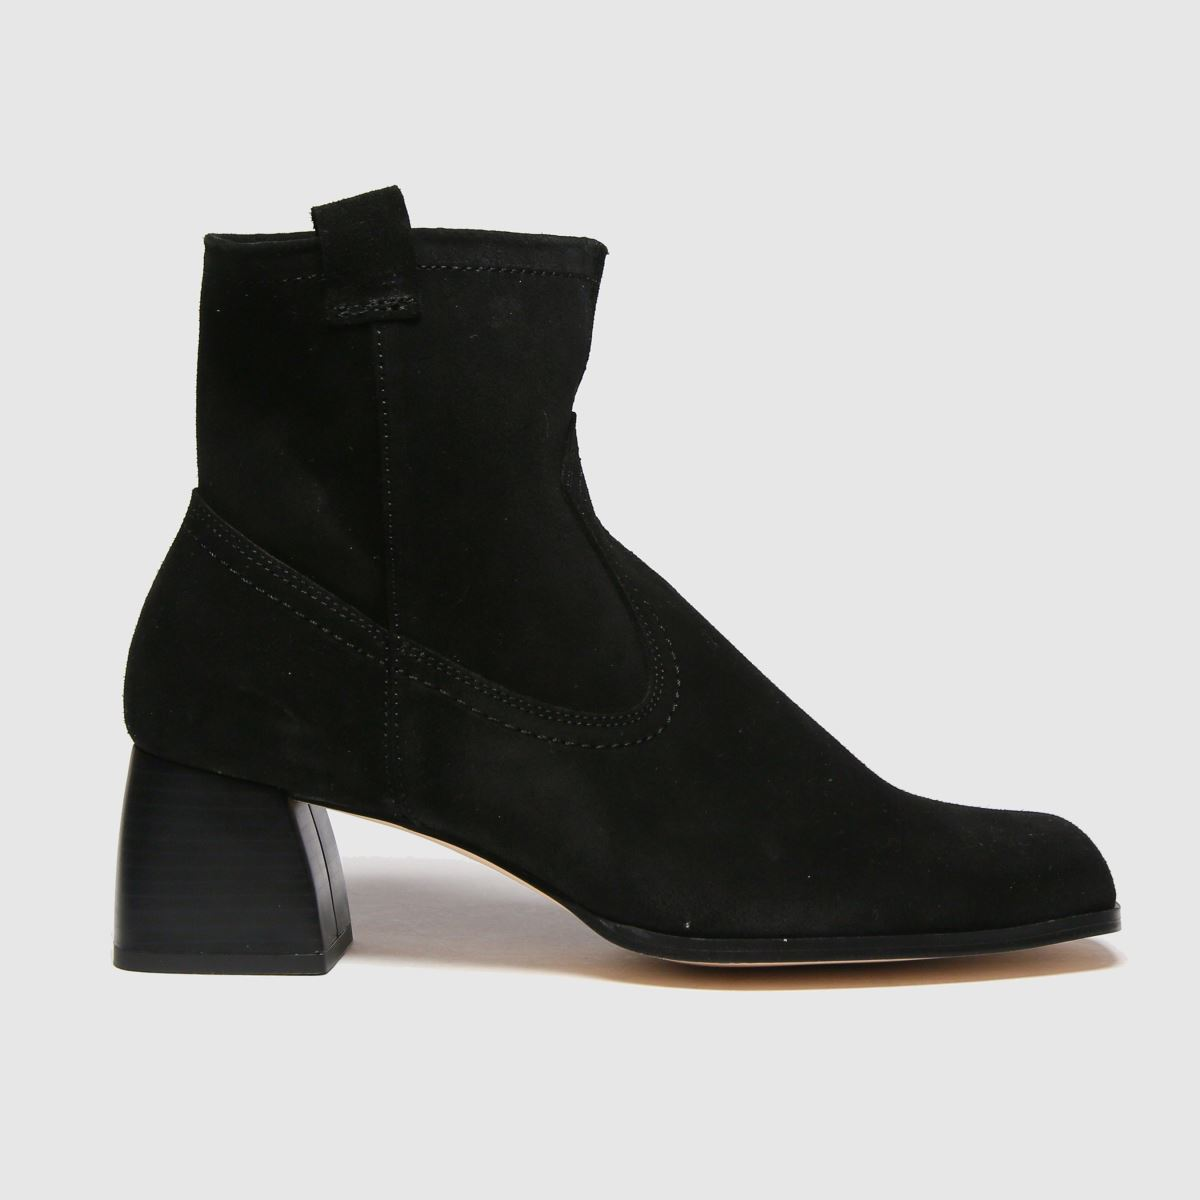 Schuh Black Beryl Suede Square Toe Boots